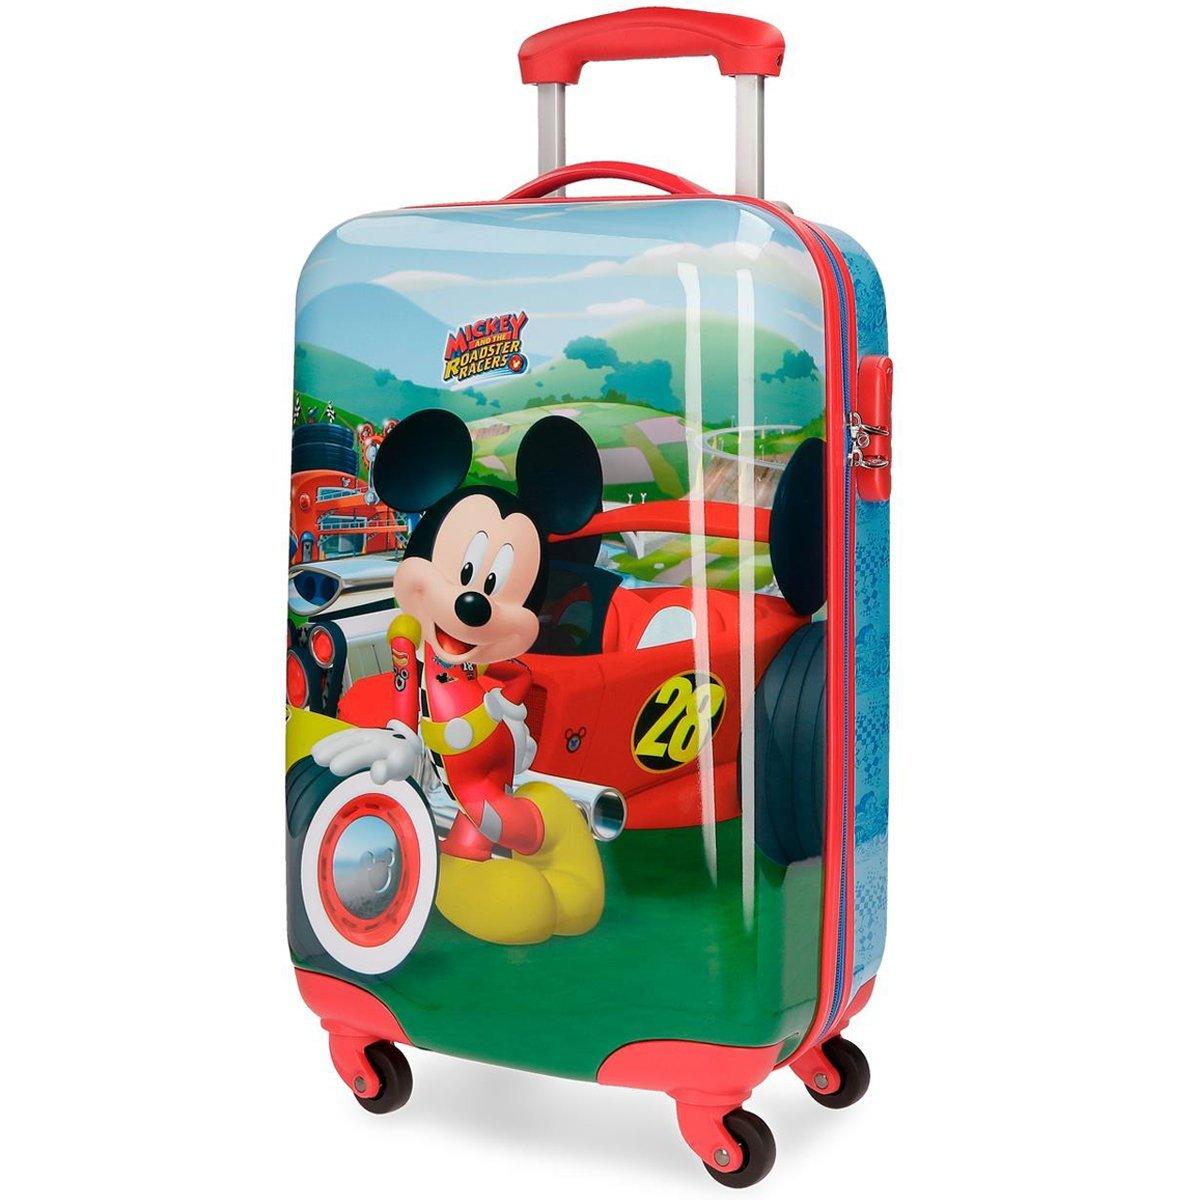 Valise Enfants Multicolore Gar/çon Disney